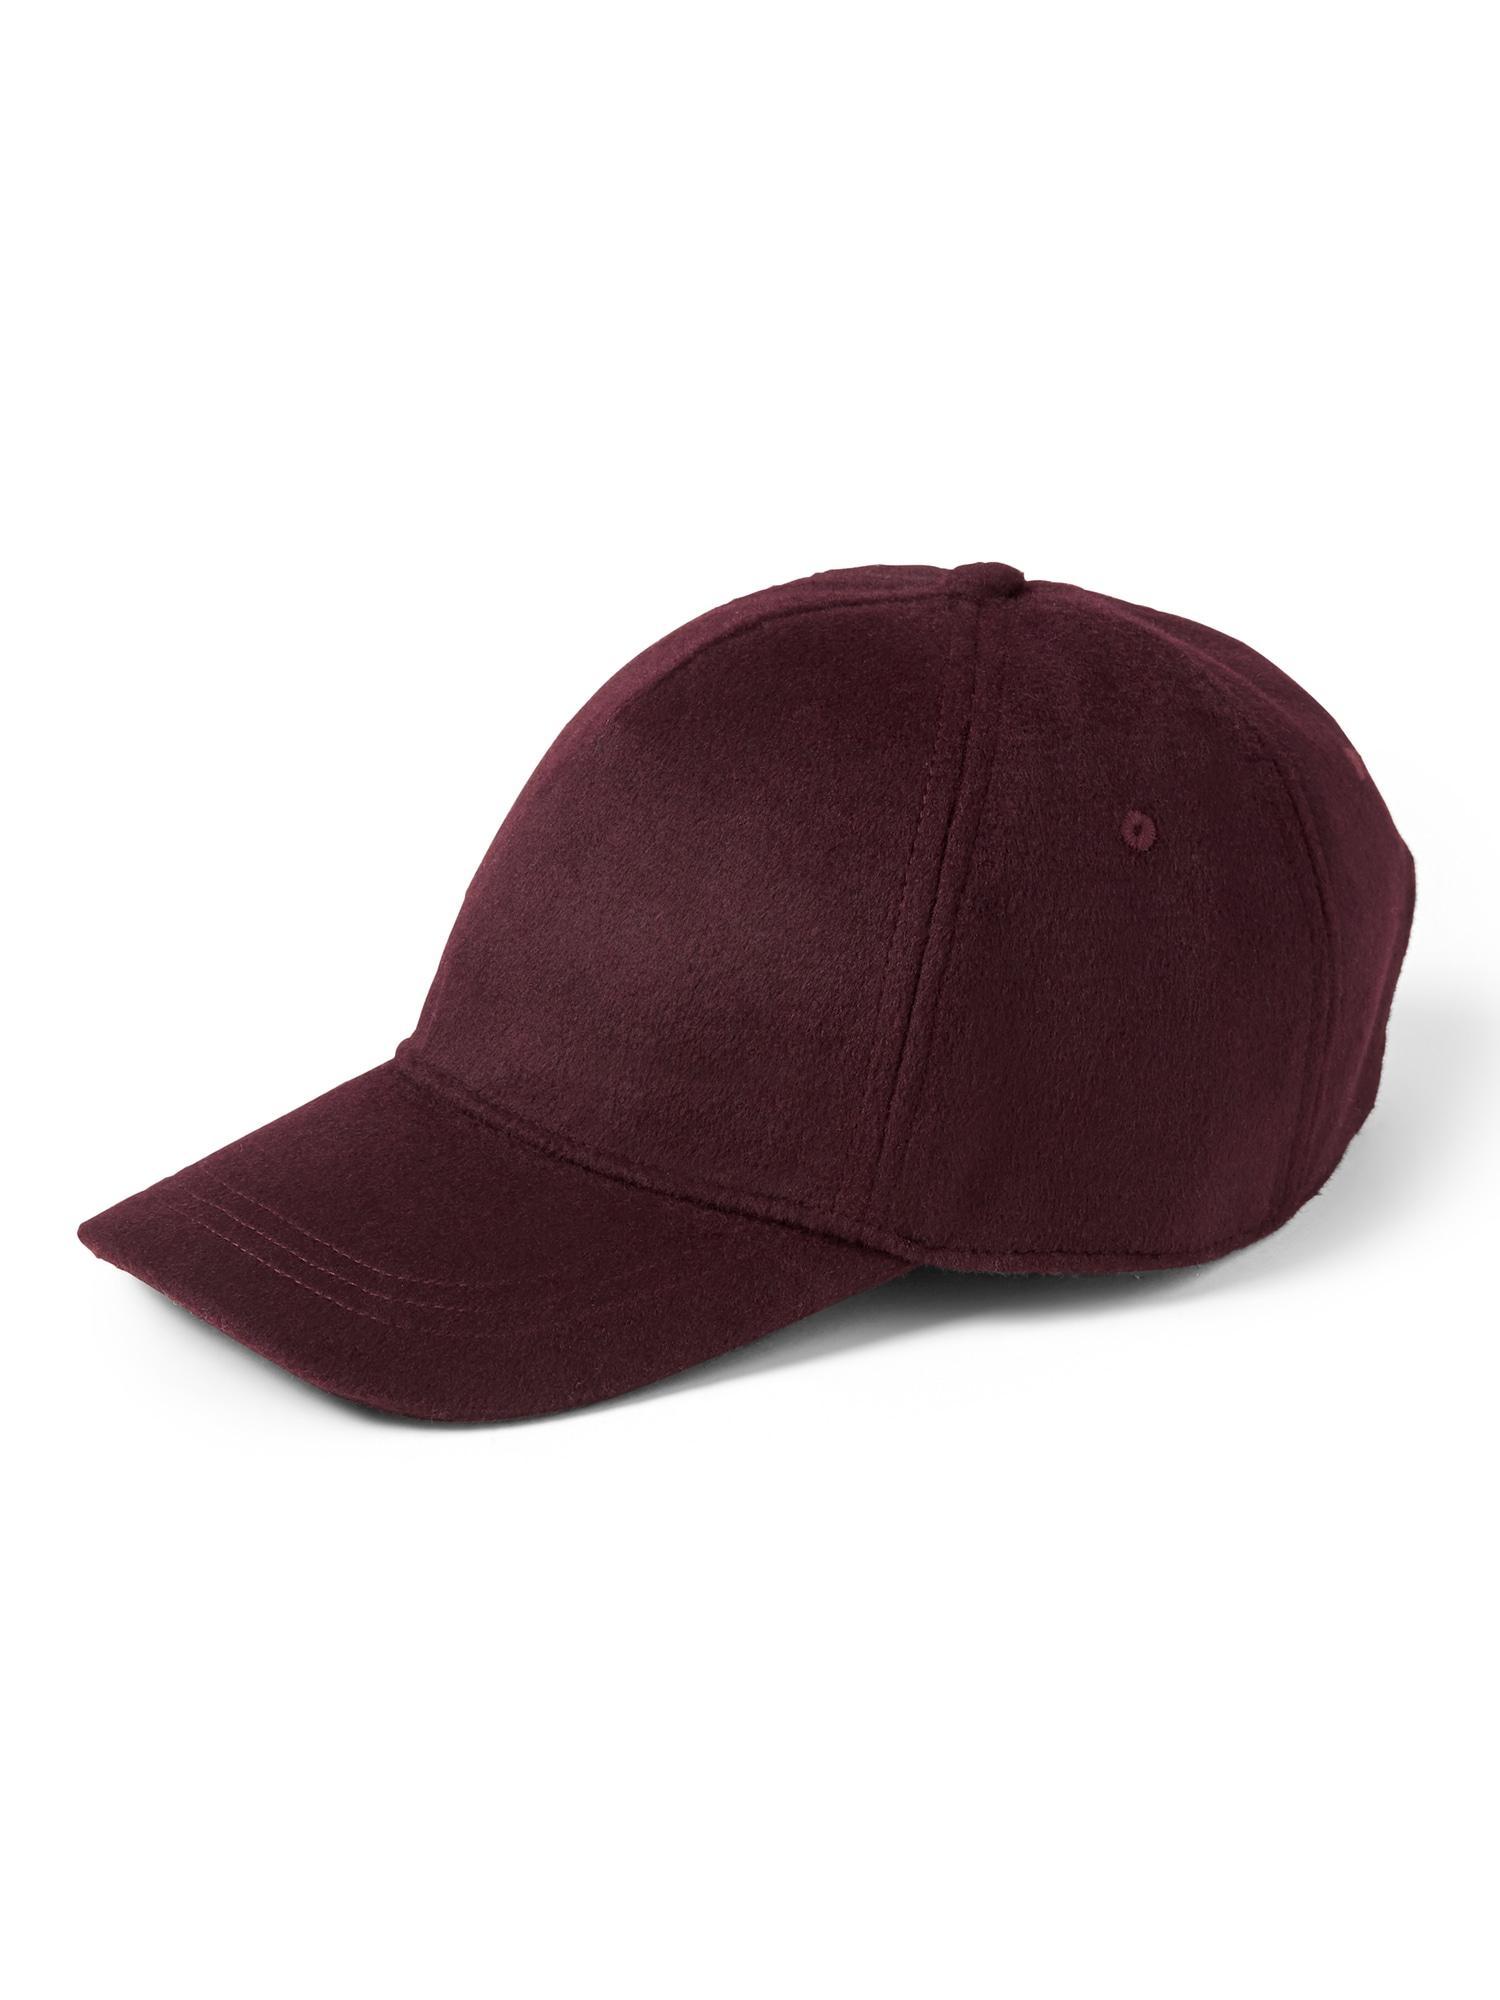 112630124 Lyst - Banana Republic Wool Felt Baseball Cap in Red for Men